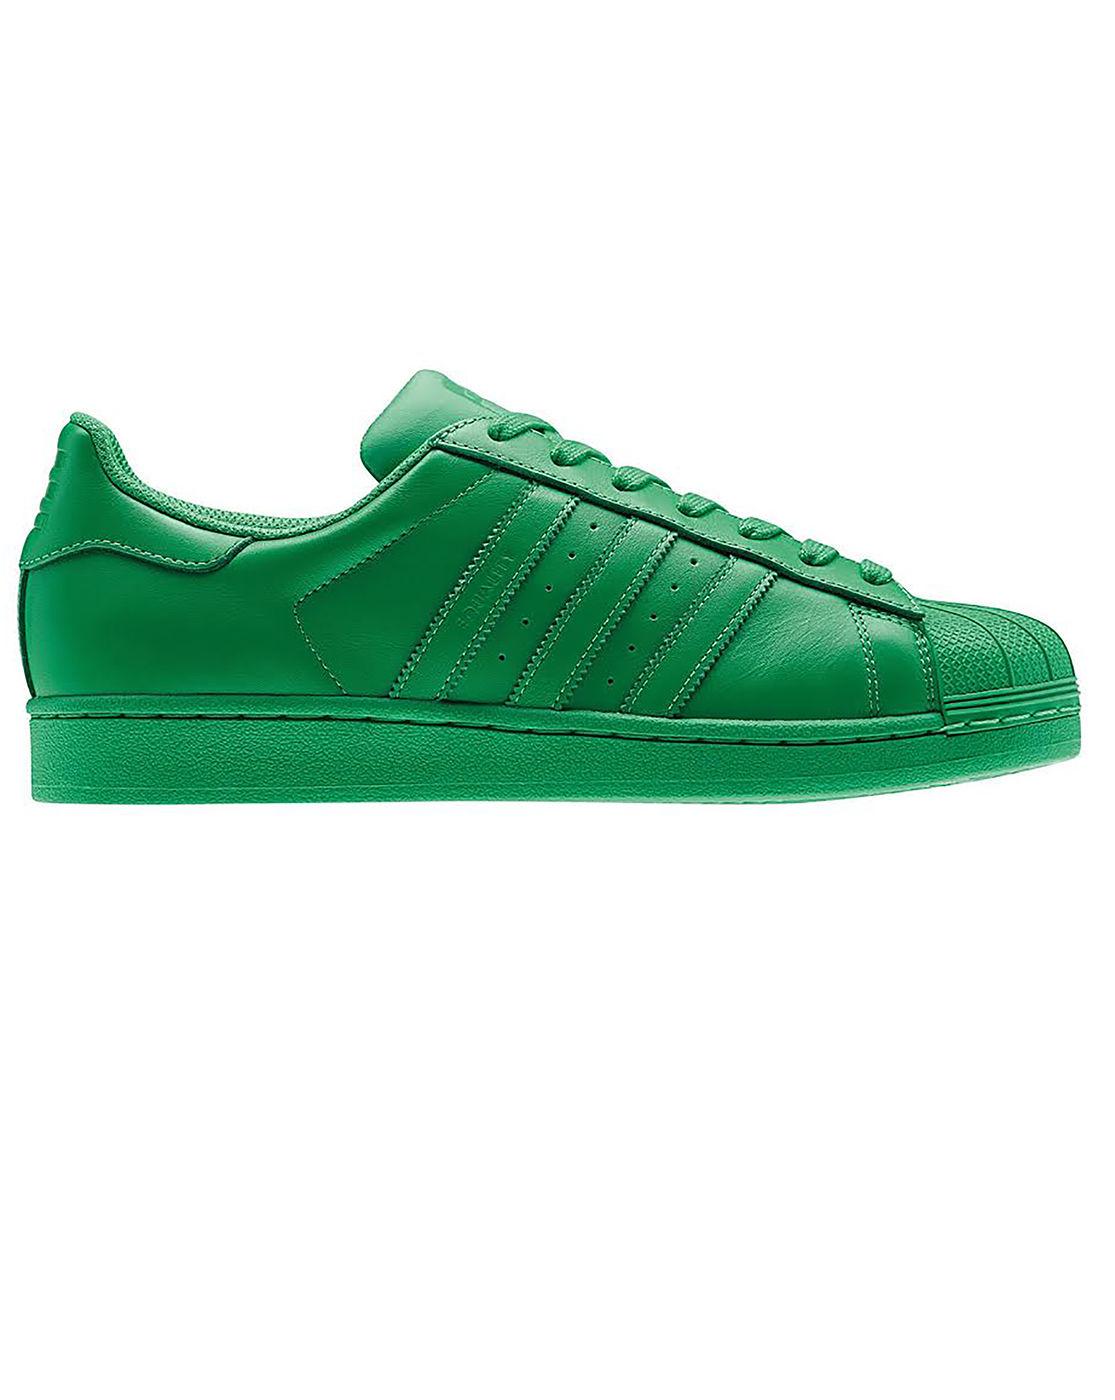 adidas originals superstar supercolor green sneakers in. Black Bedroom Furniture Sets. Home Design Ideas